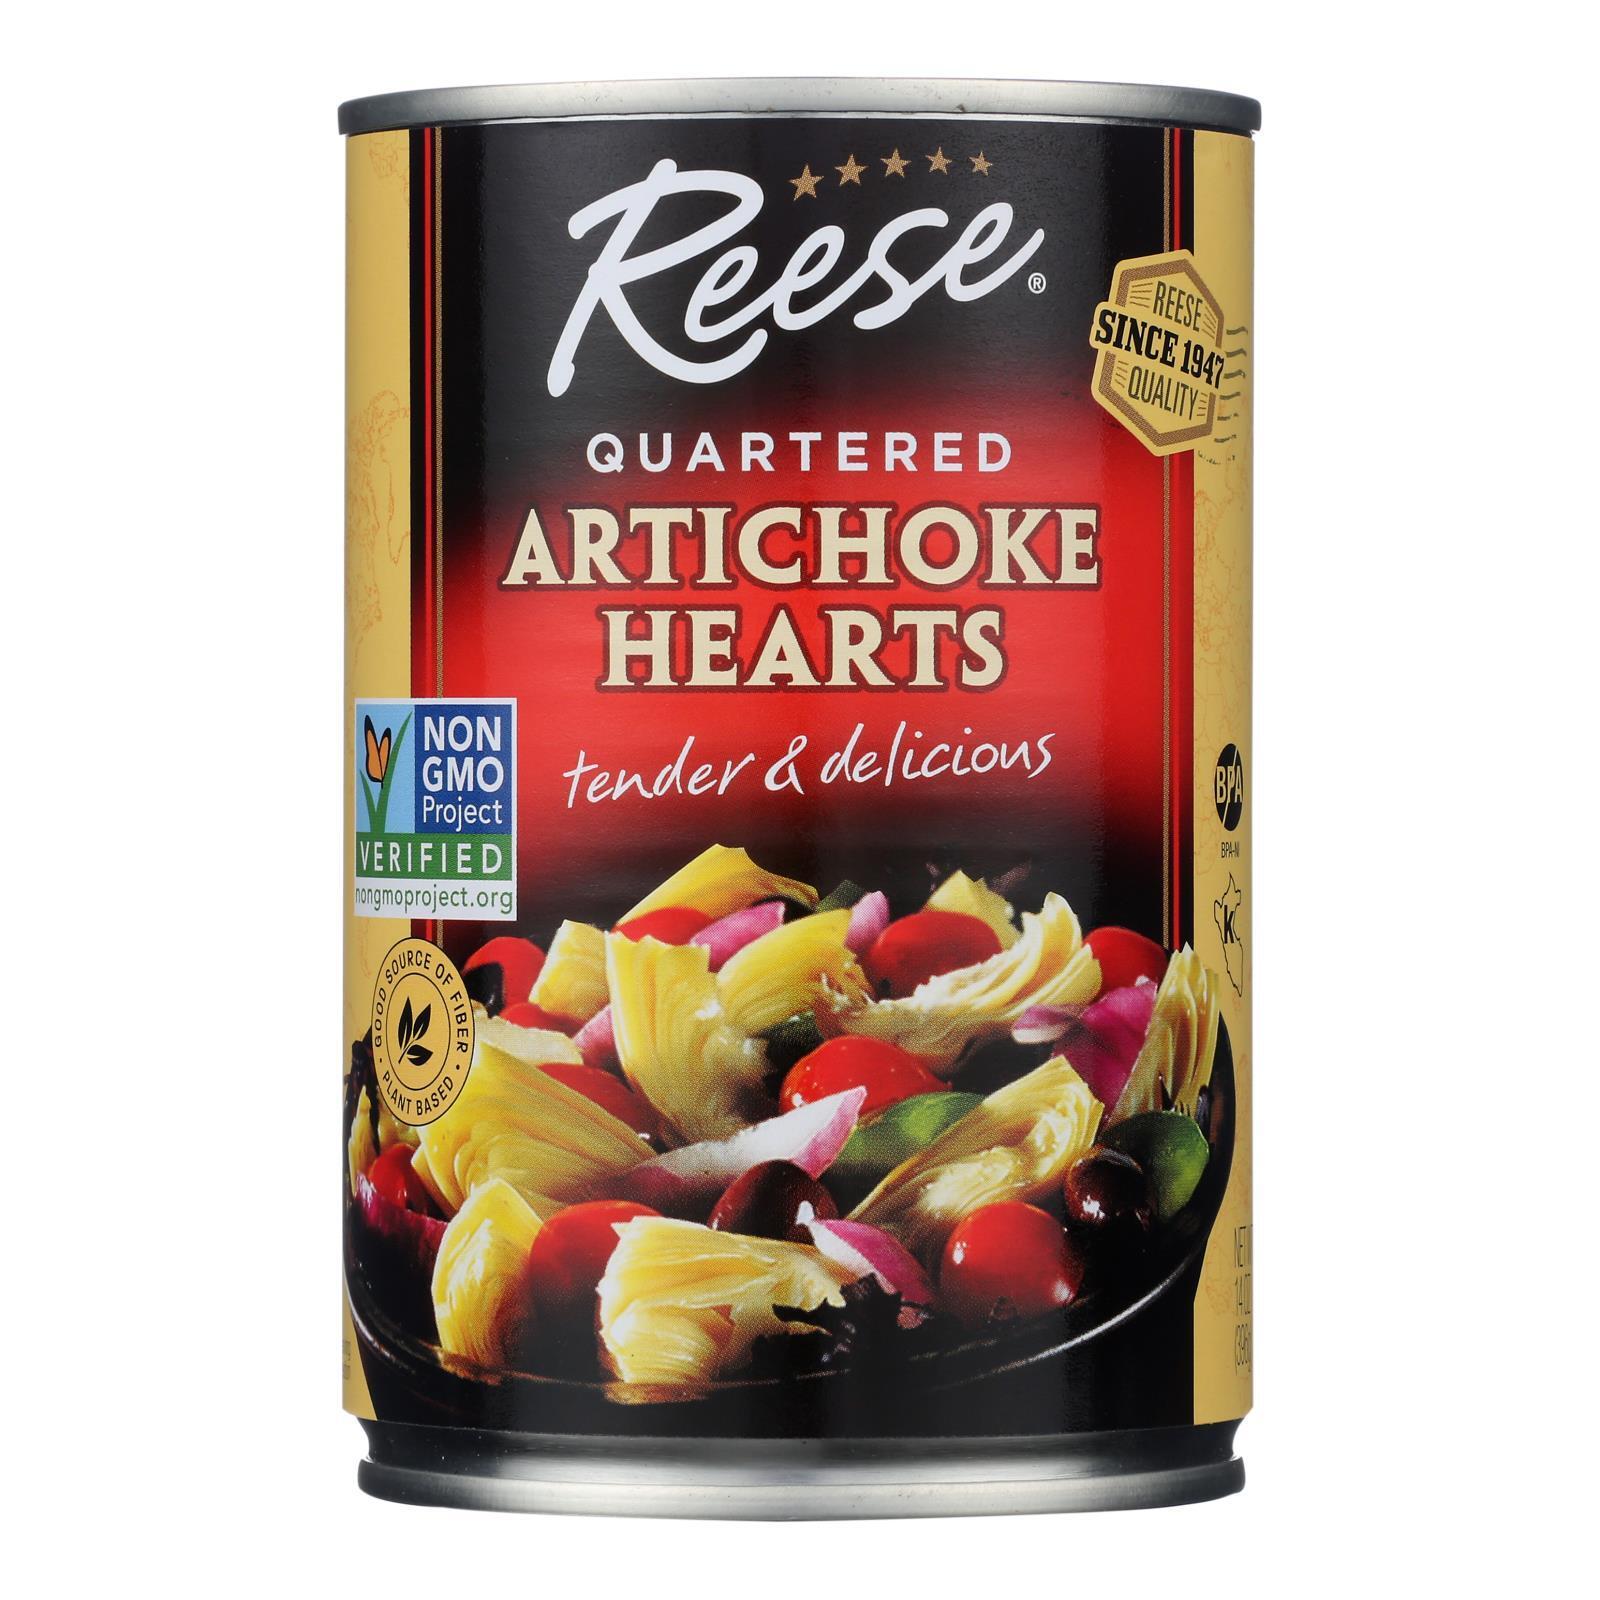 Reese Artichoke Hearts - Quartered - Case of 12 - 14 oz.